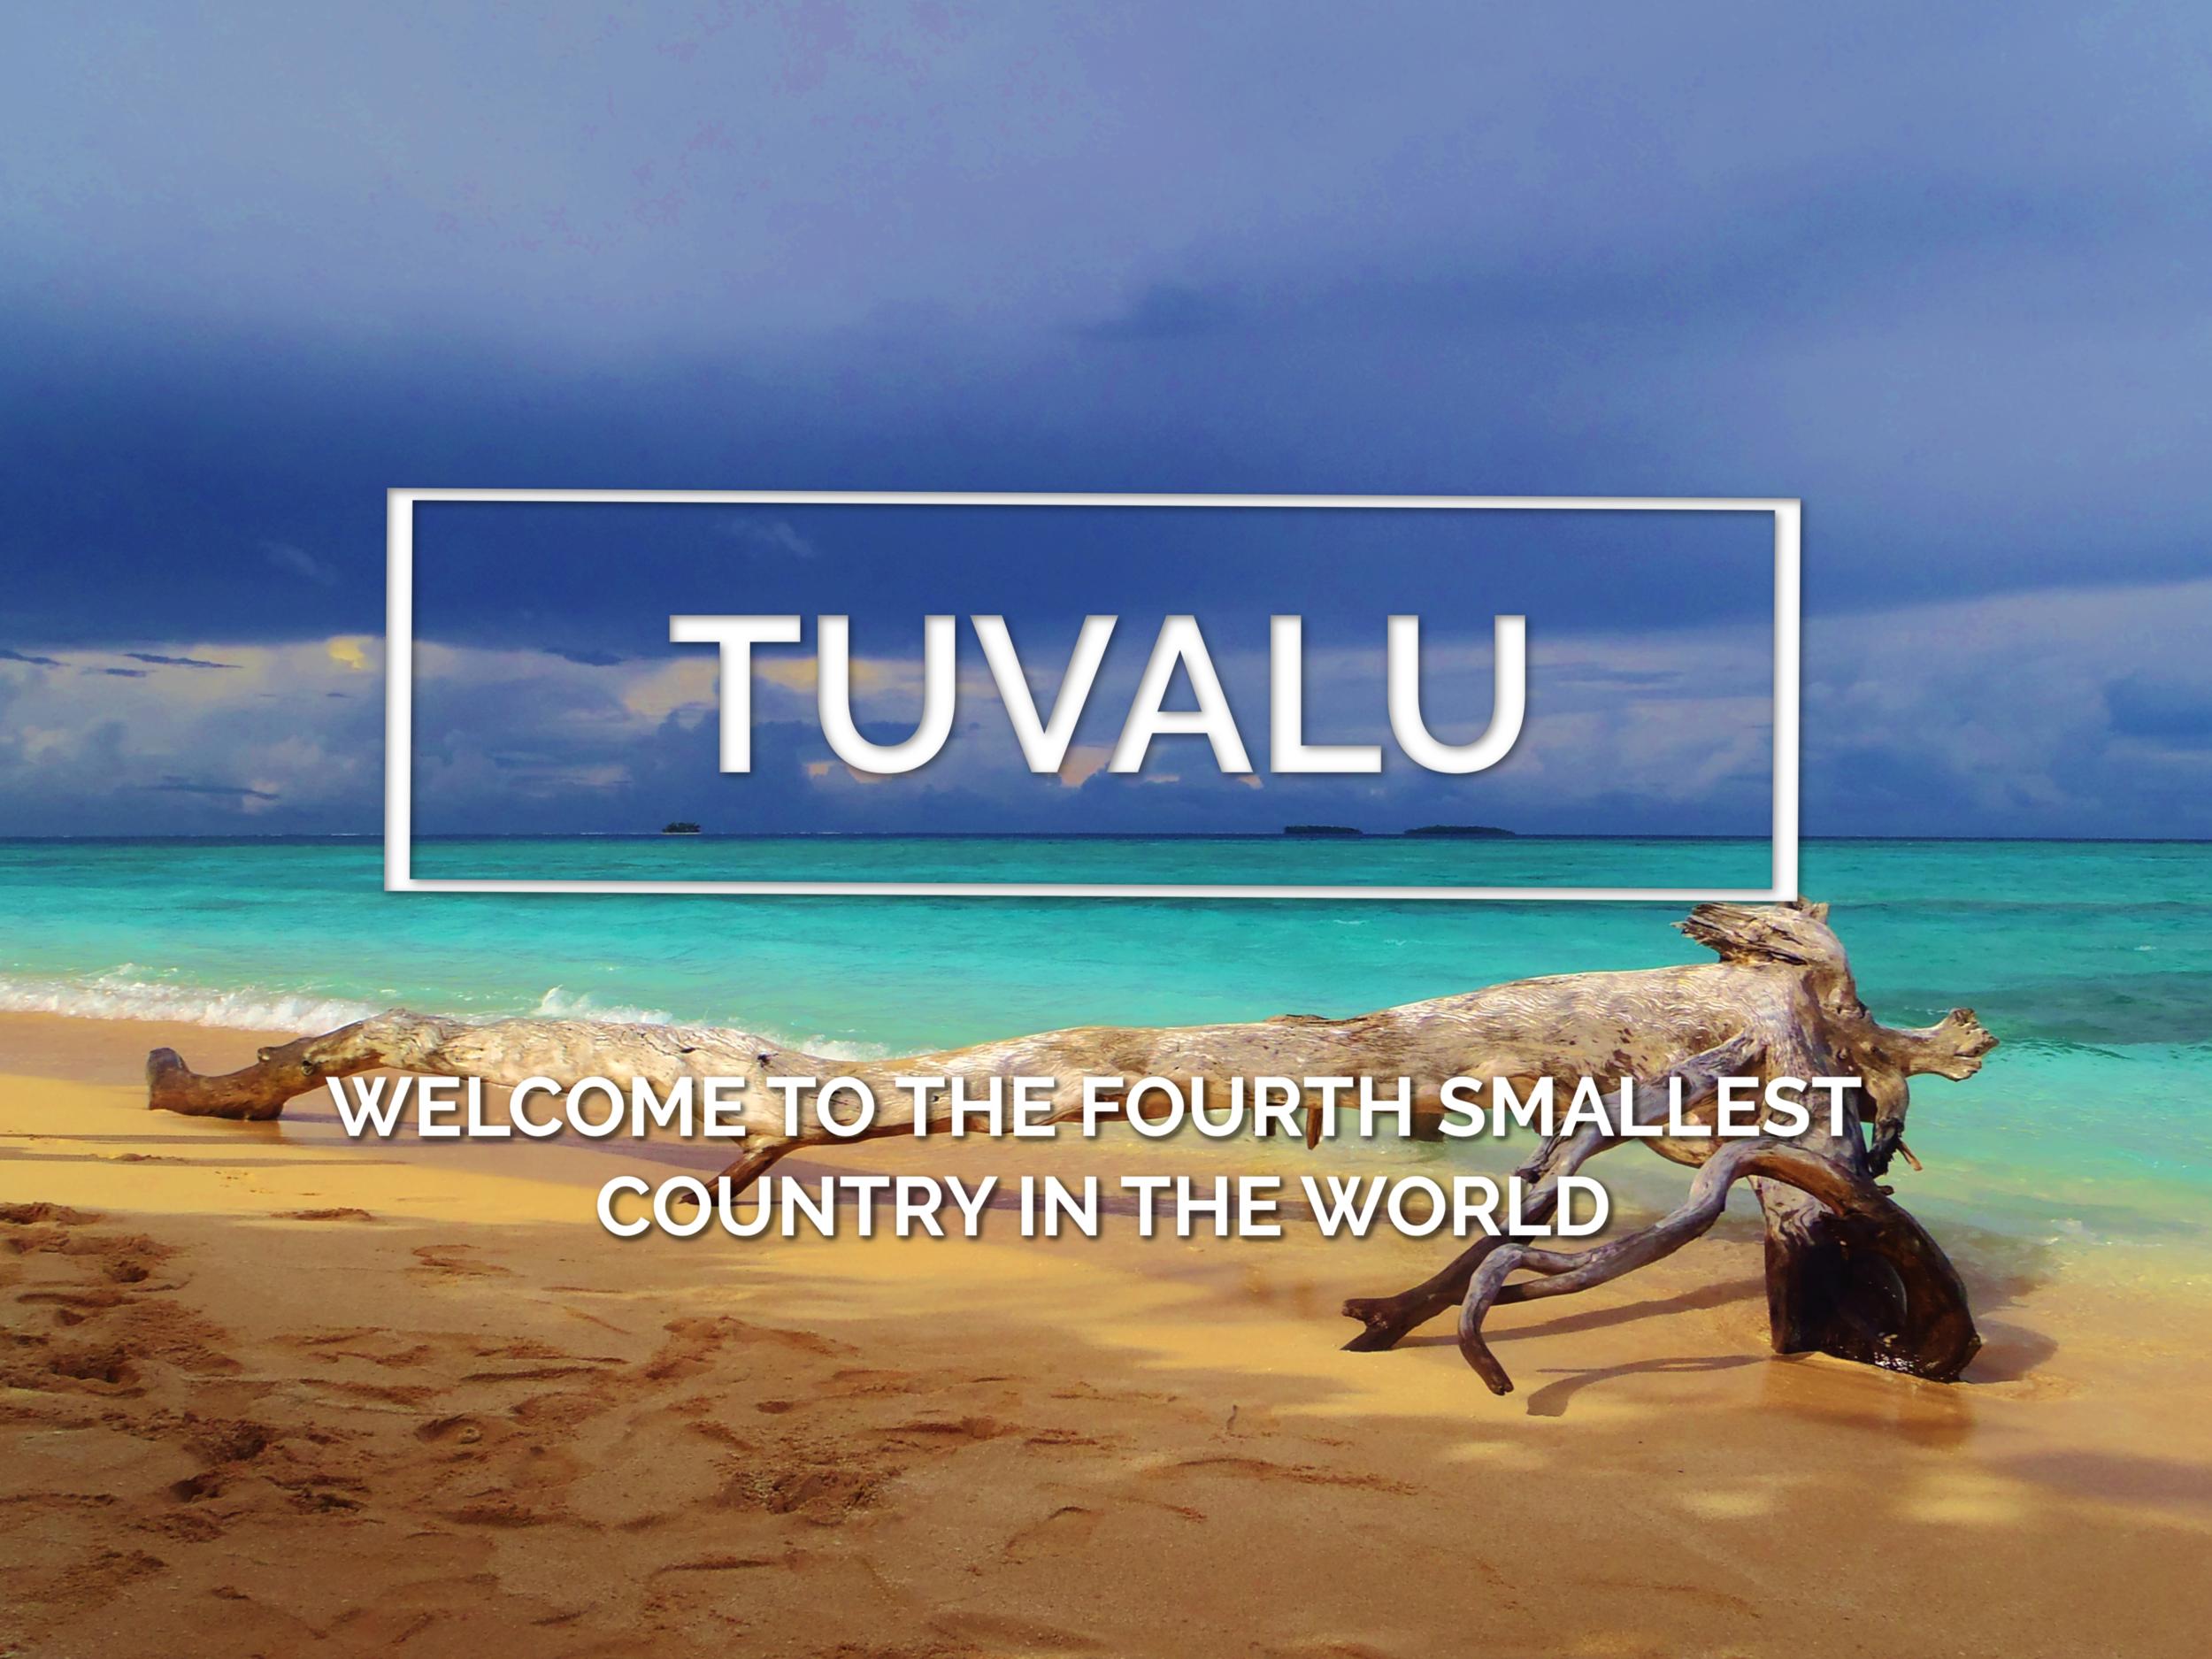 PicMonkey - Tuvalu.png